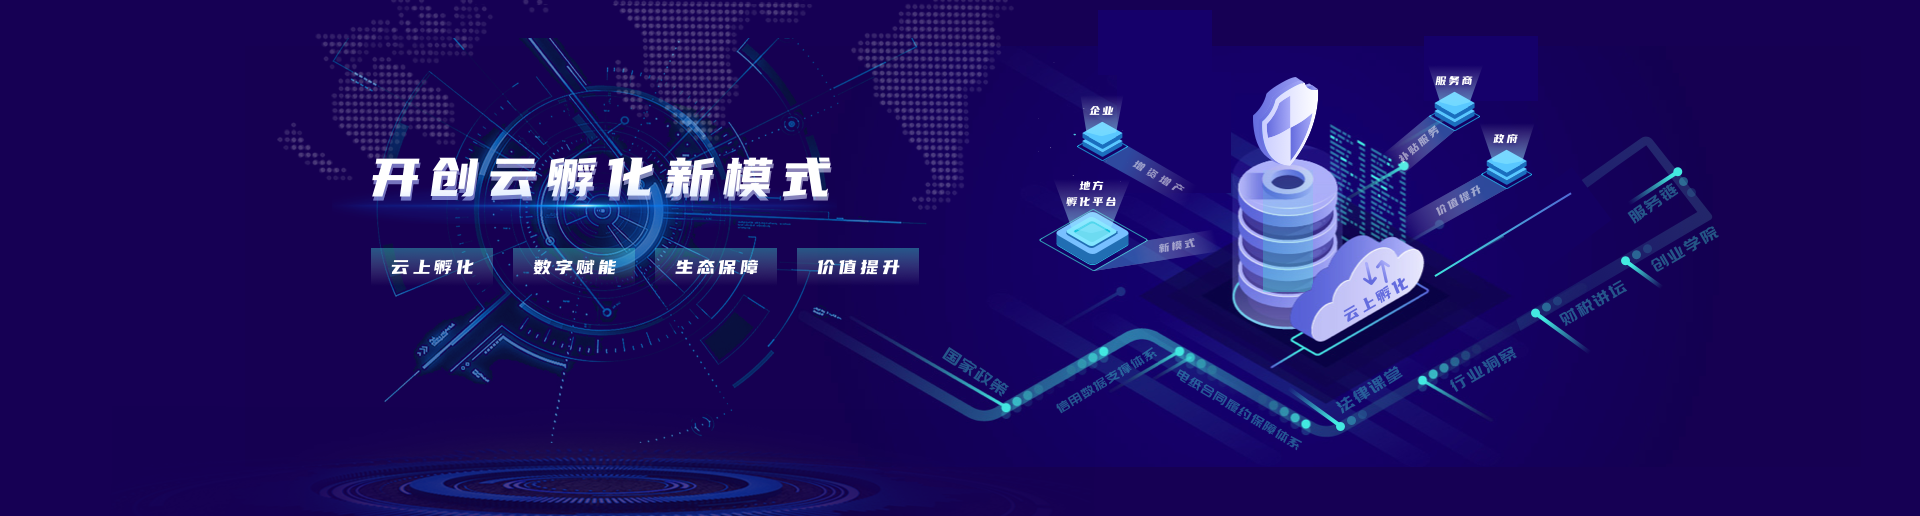 portal_yc_bg_banner_1